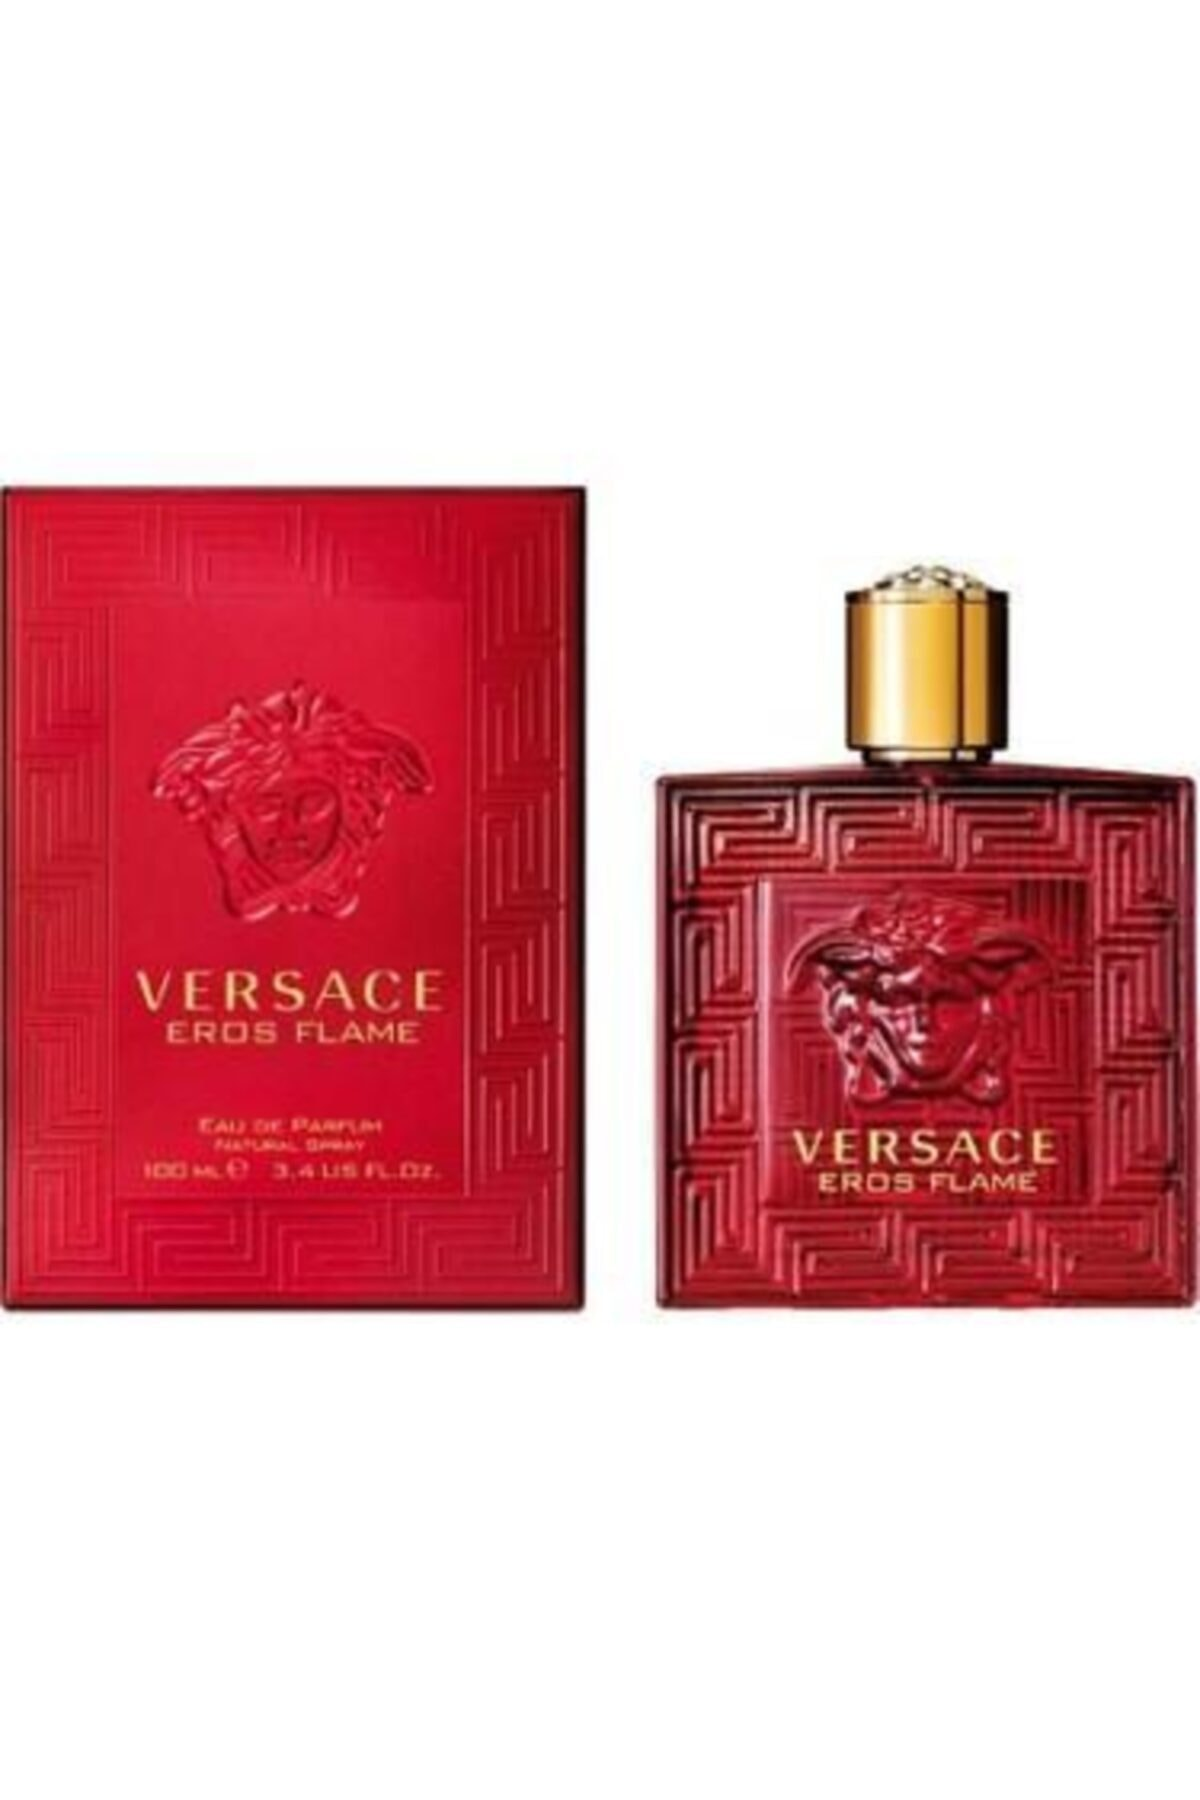 Versace Eros Flame Edp 100 ml Erkek Parfüm 8011003845354 2